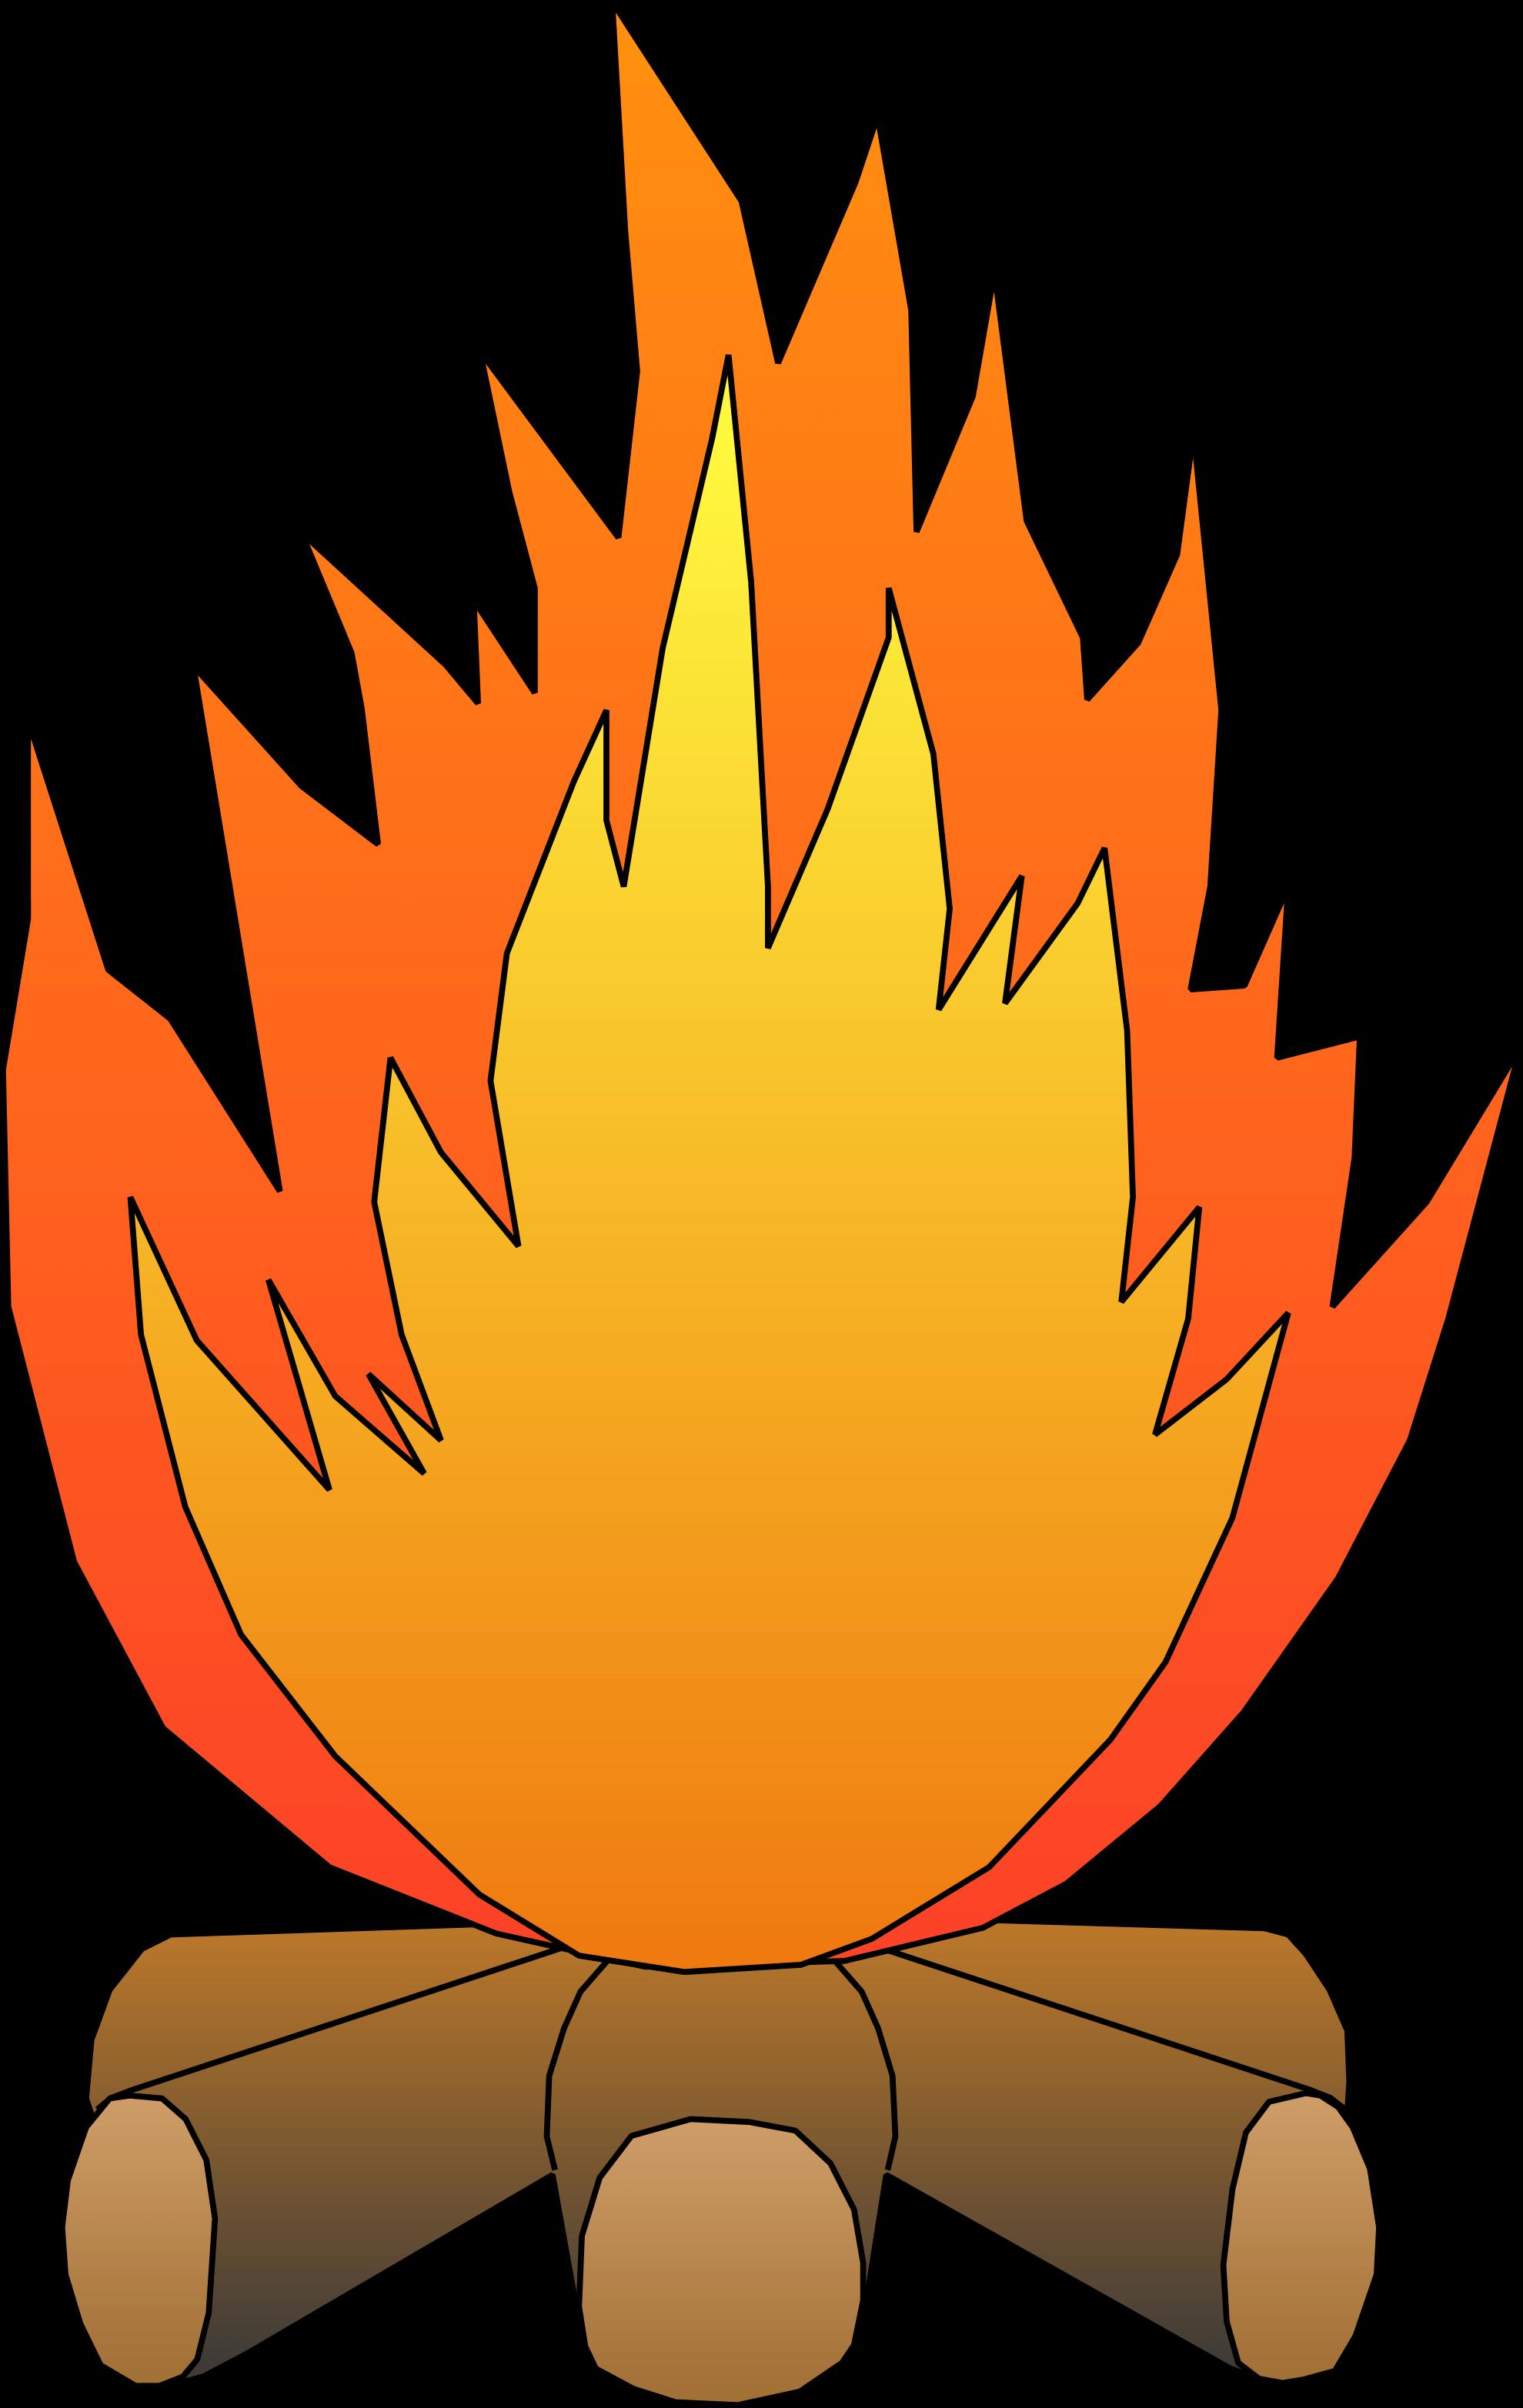 Fireplace clipart cute. Cartoon free download best